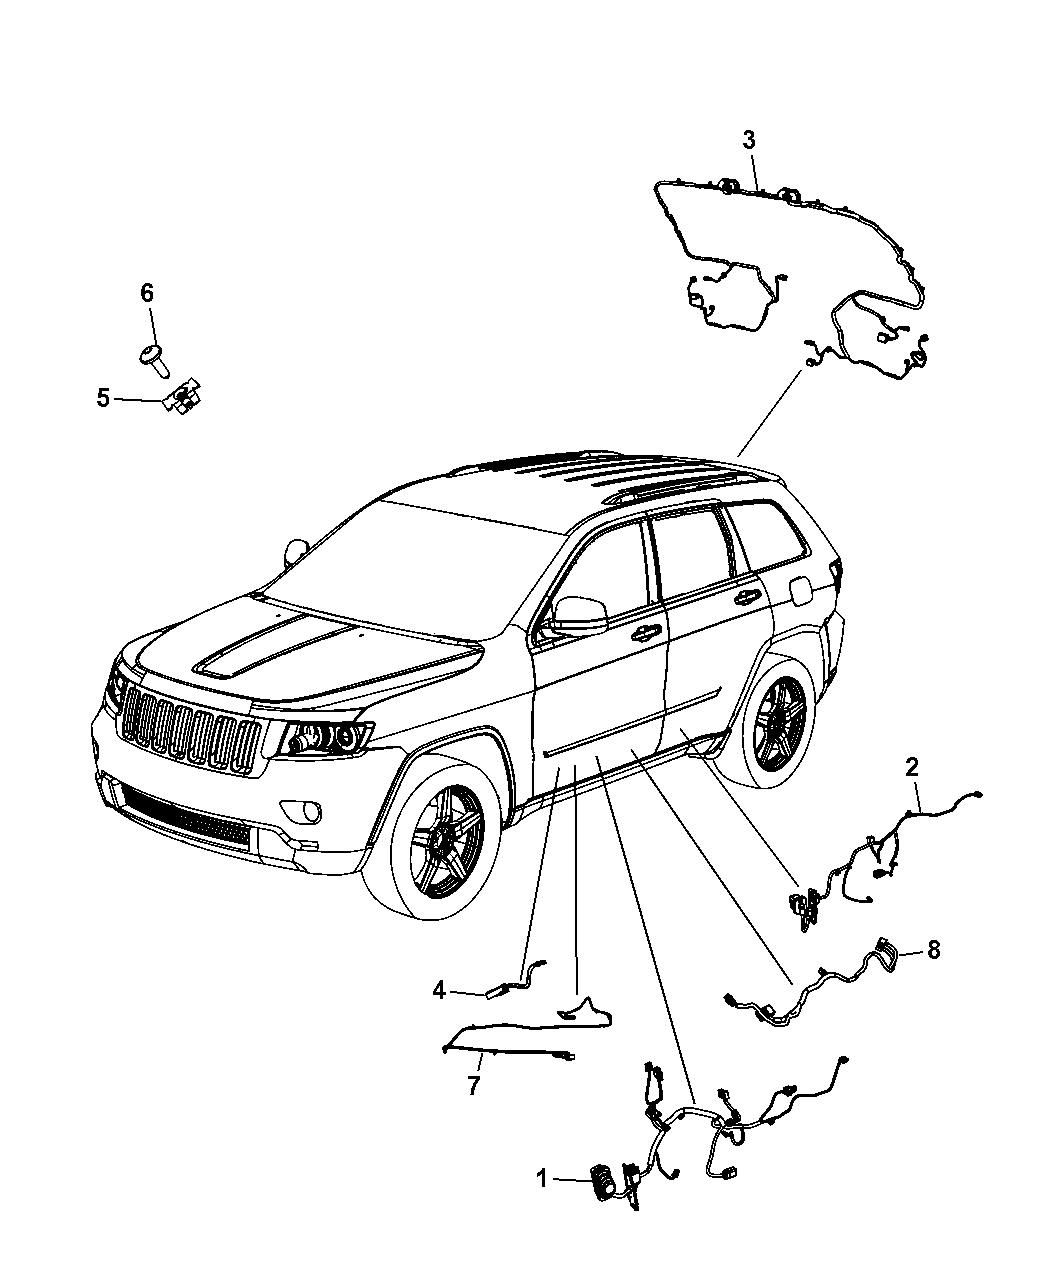 cj 7 cherokee wiring jeep - auto electrical wiring diagram cj 7 cherokee wiring jeep